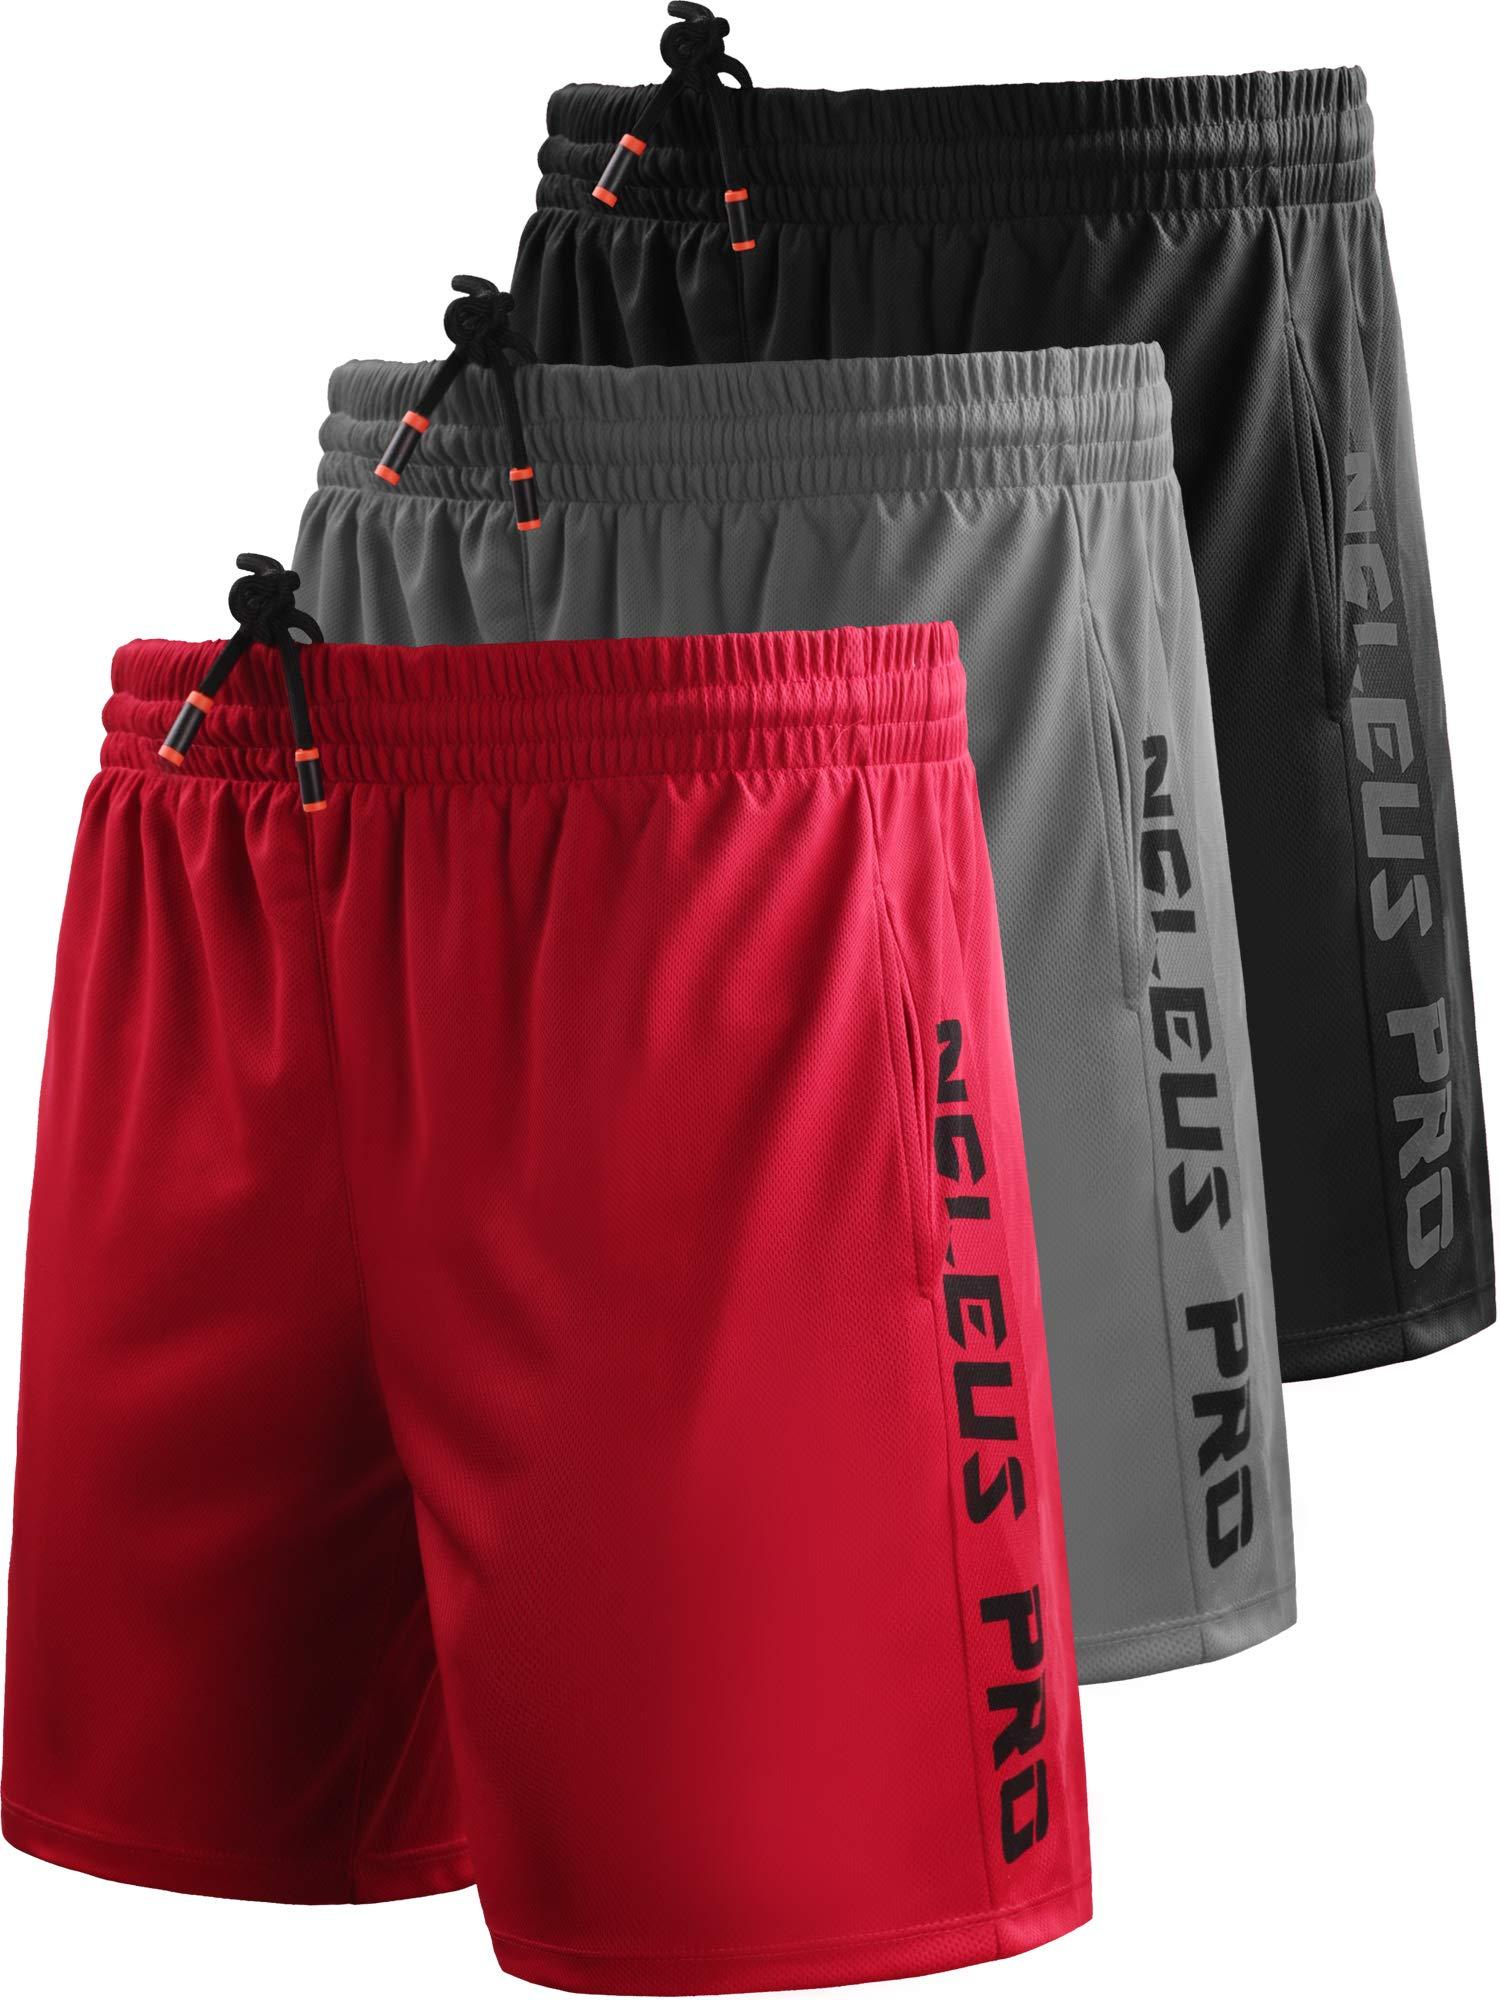 Neleus Men's 7'' Workout Running Shorts with Pockets,6056,3 Pack,Black/Grey/Red,2XL,EU 3XL by Neleus